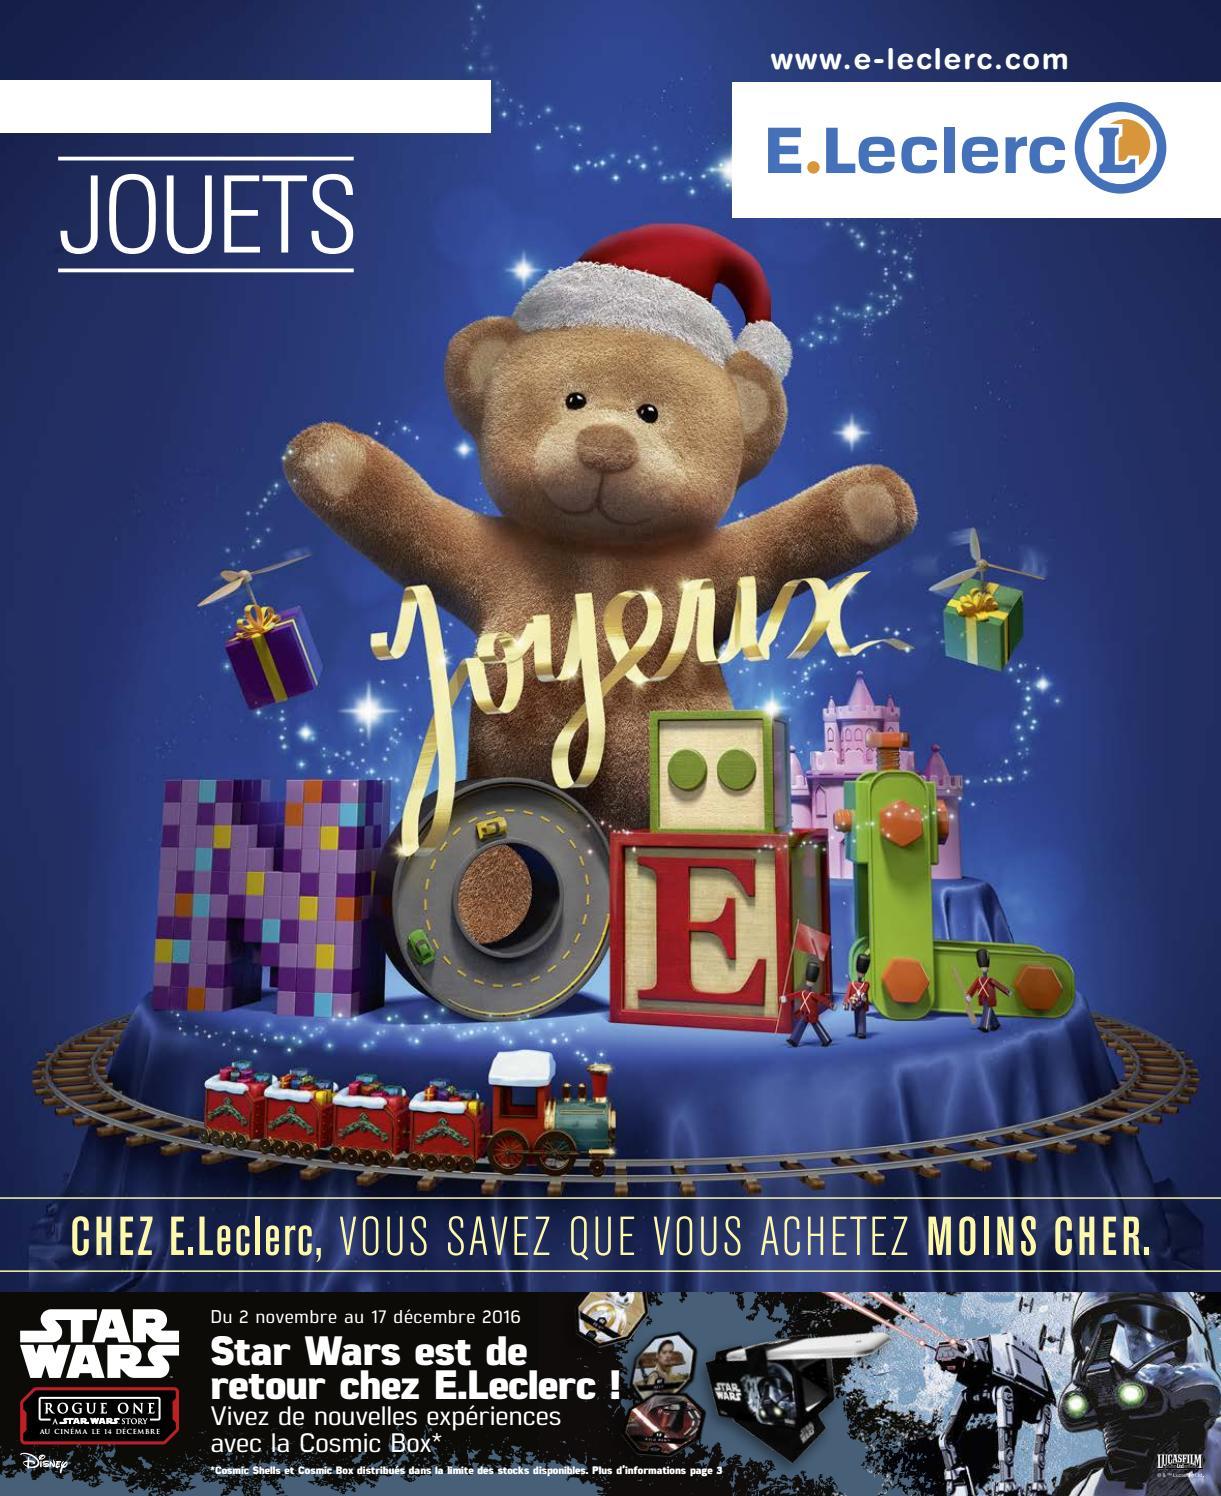 Catalogue E Leclerc Special Jeux Et Jouets Noel 2016 By Lsa Conso Issuu